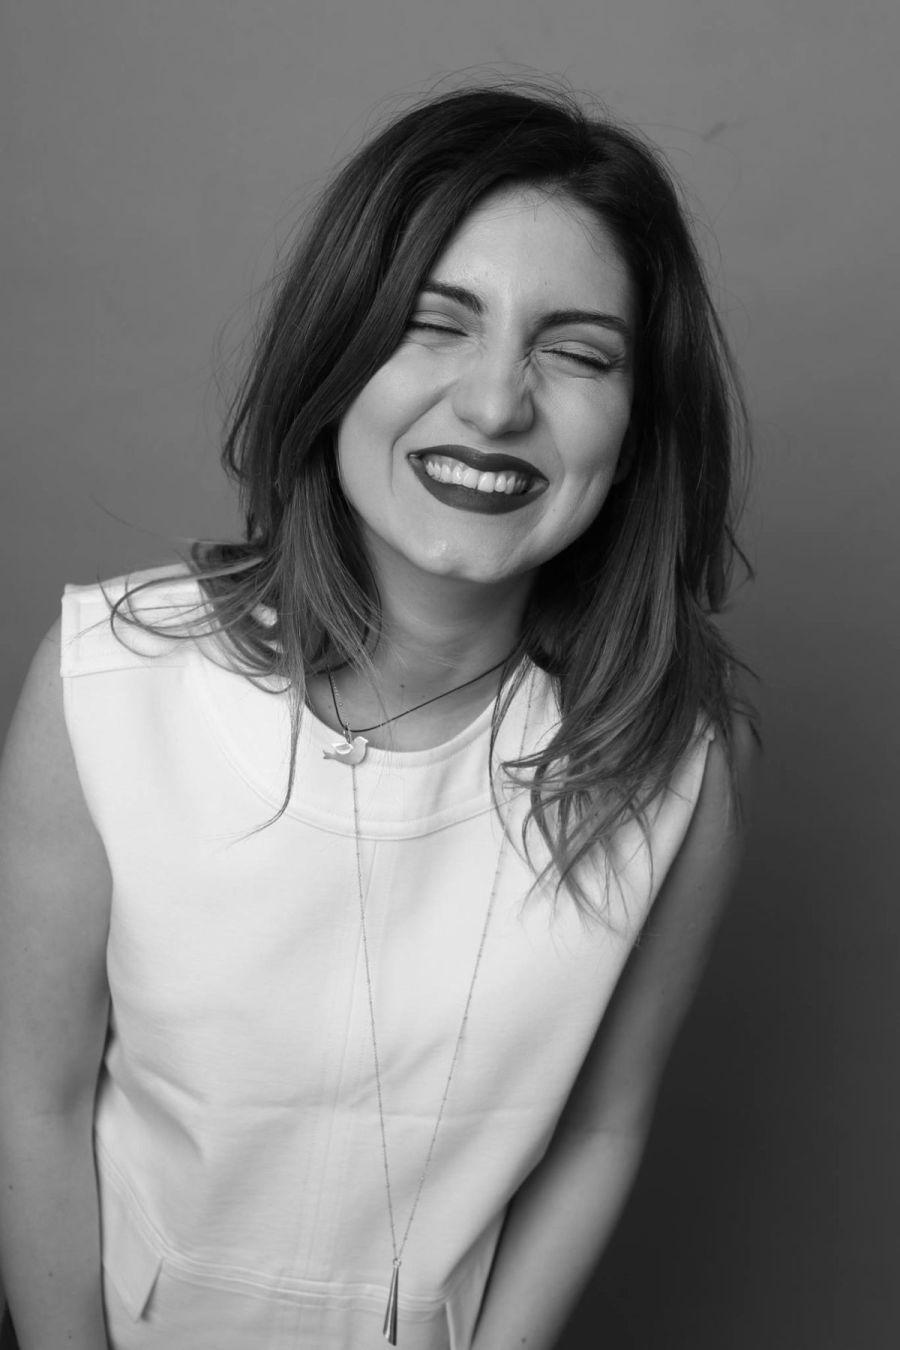 Ioana Oprea_make-up artist_ritual de frumusete_happytude.ro_